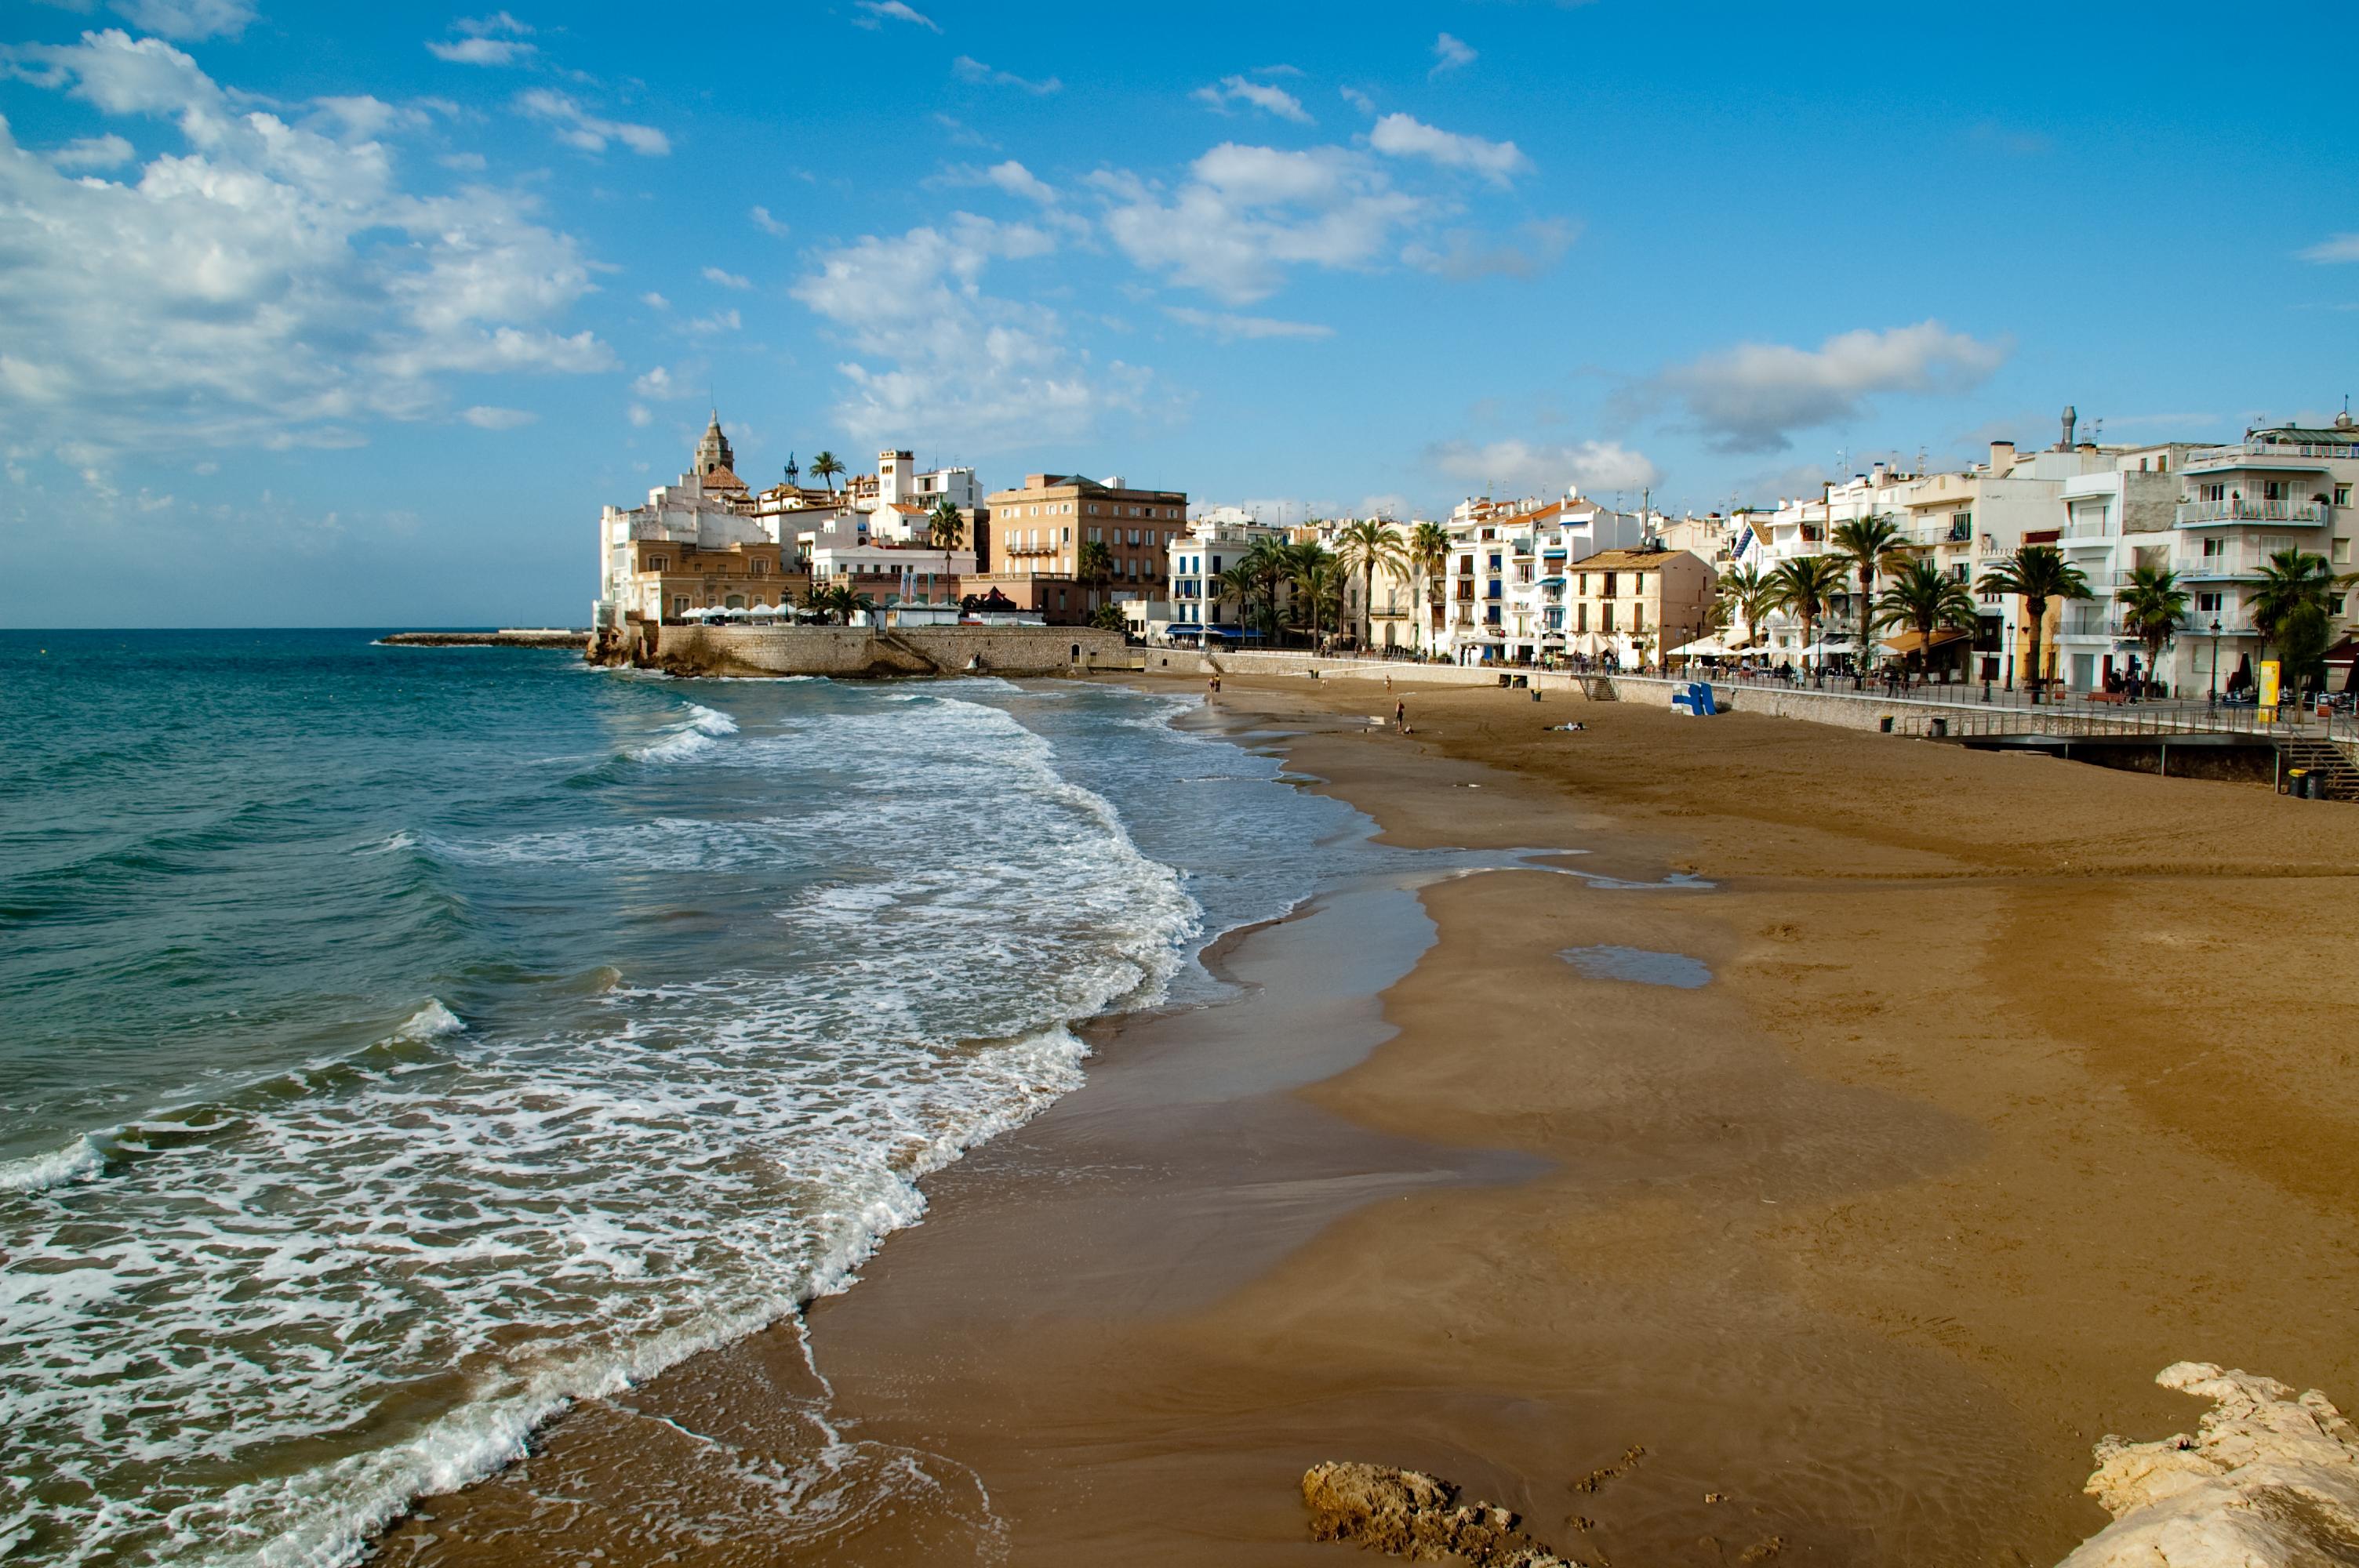 las mejores playas de barcelona, playas de barcelona, playa, las mejores playas, las mejores, españa, playa, arena, barcelona, tourism, turismo, beachs, sea, takemysecrets